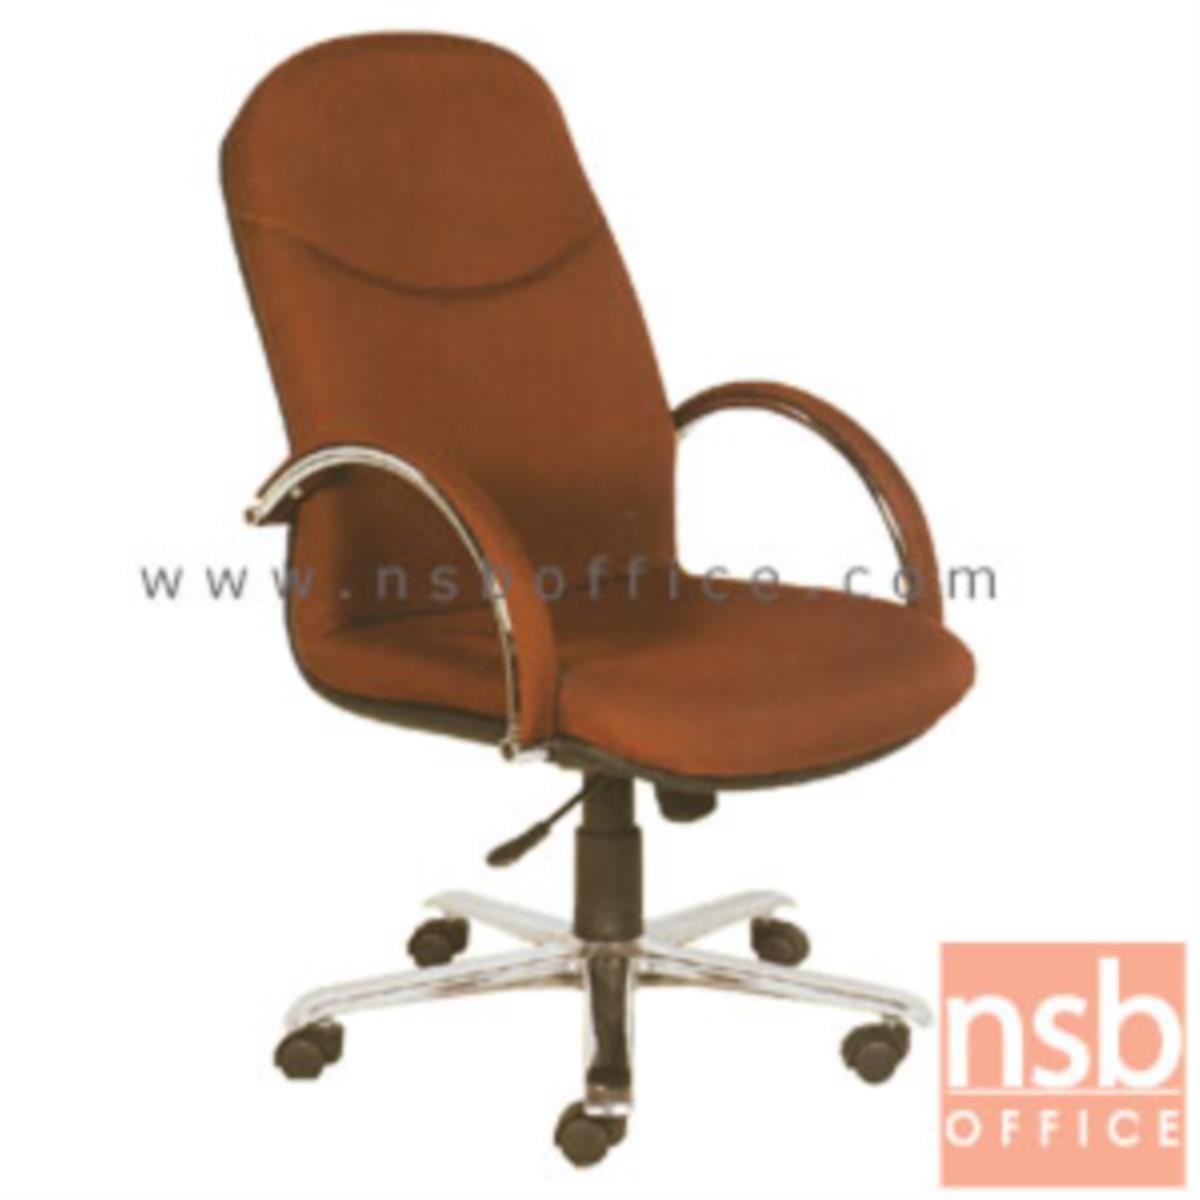 B26A059 :เก้าอี้สำนักงาน รุ่น AS-178N  โช๊คแก๊ส มีก้อนโยก ขาเหล็กชุบโครเมี่ยม